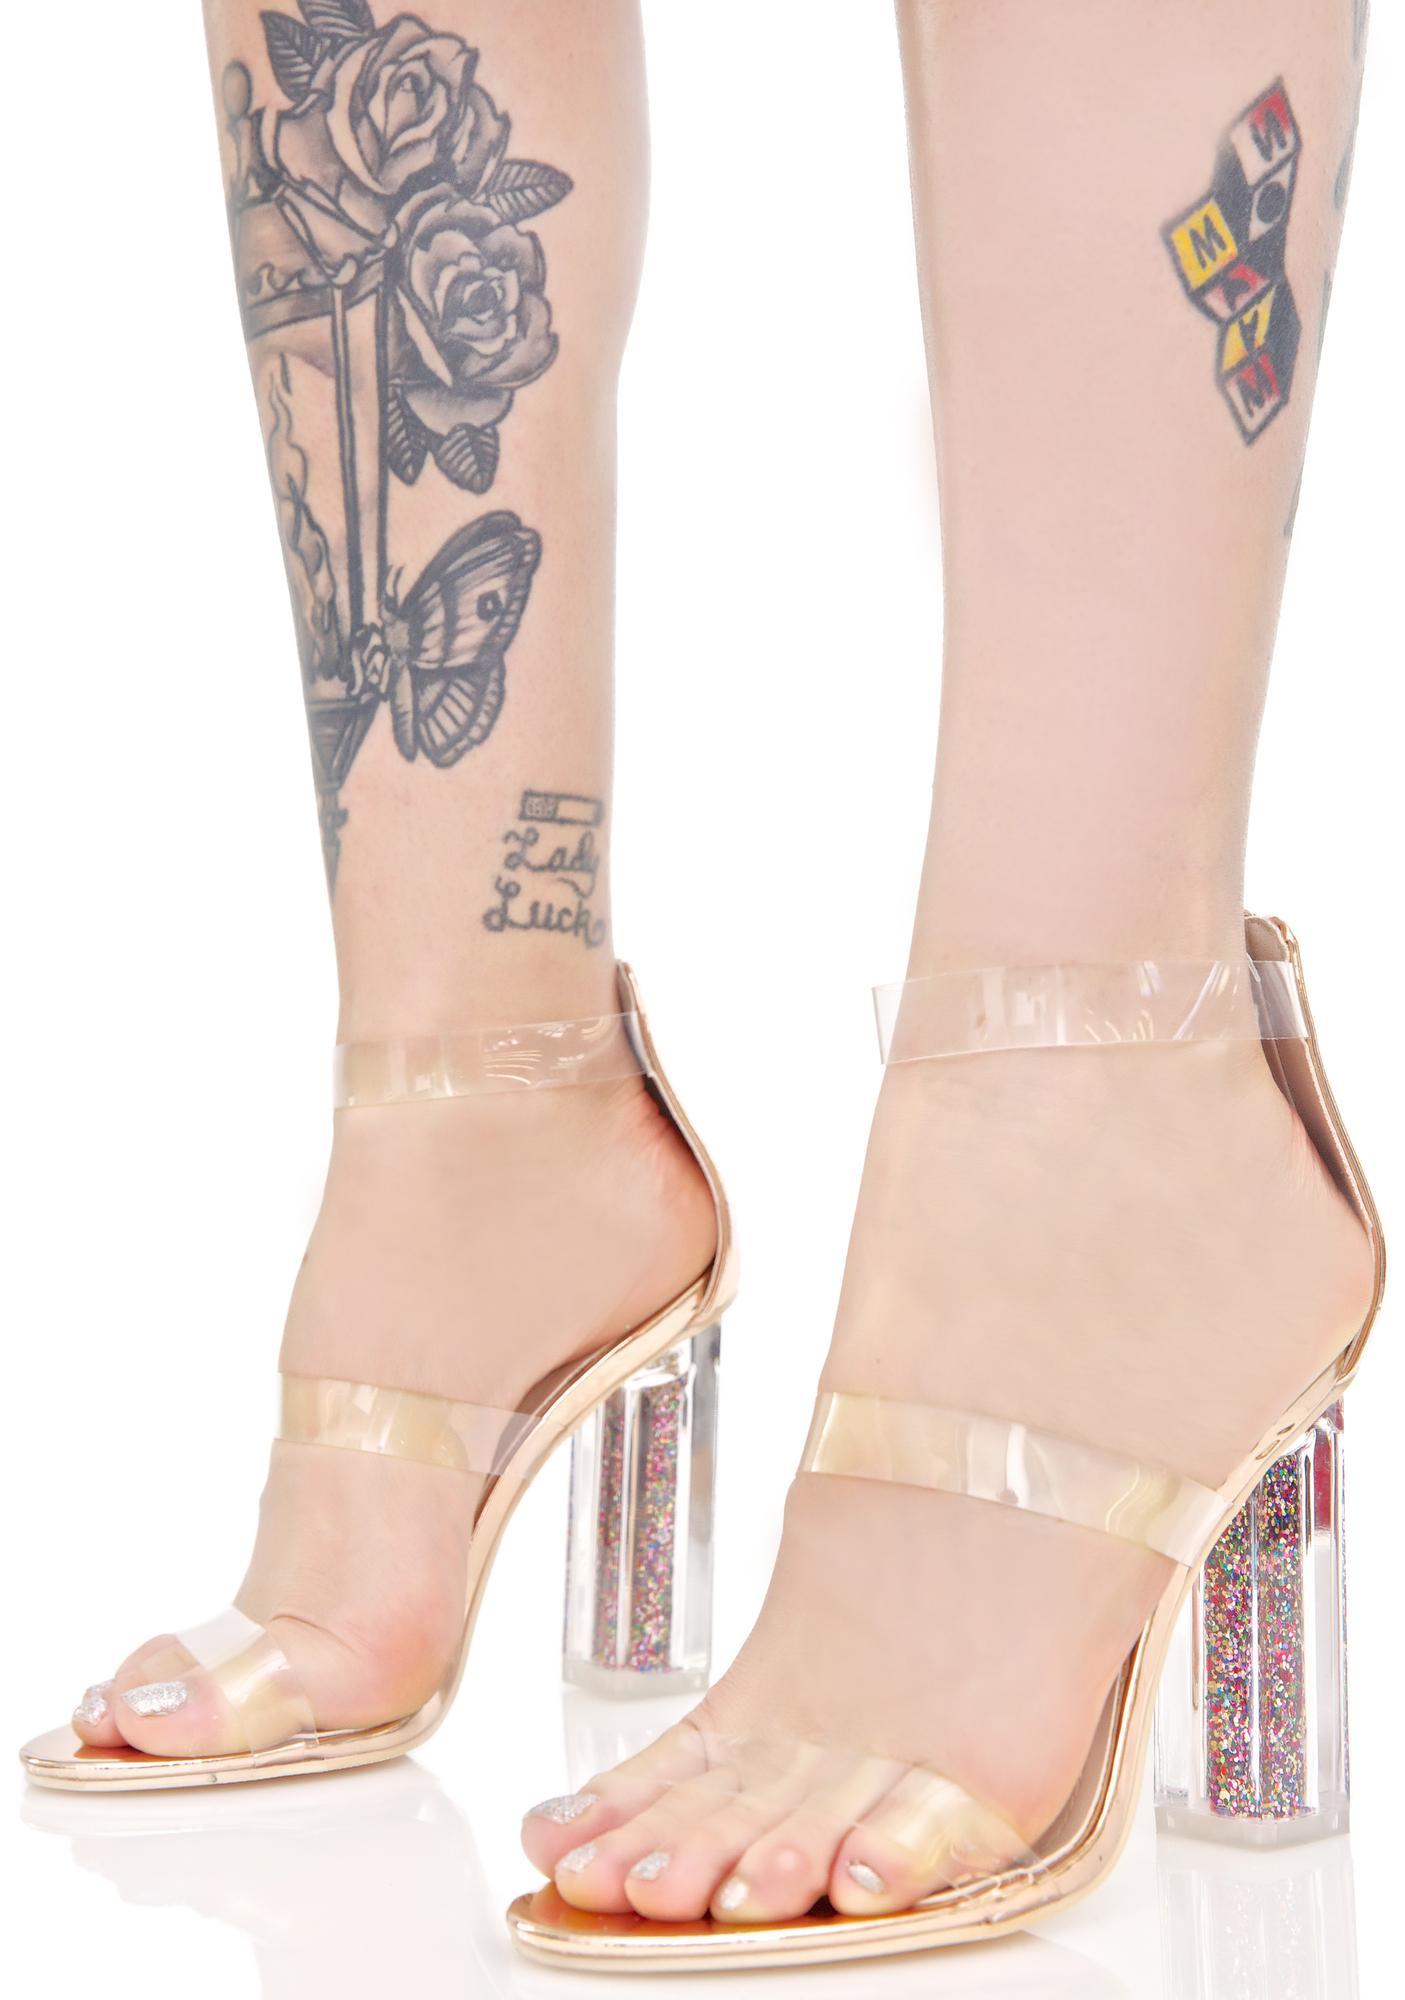 Dance 4 You Clear Heels